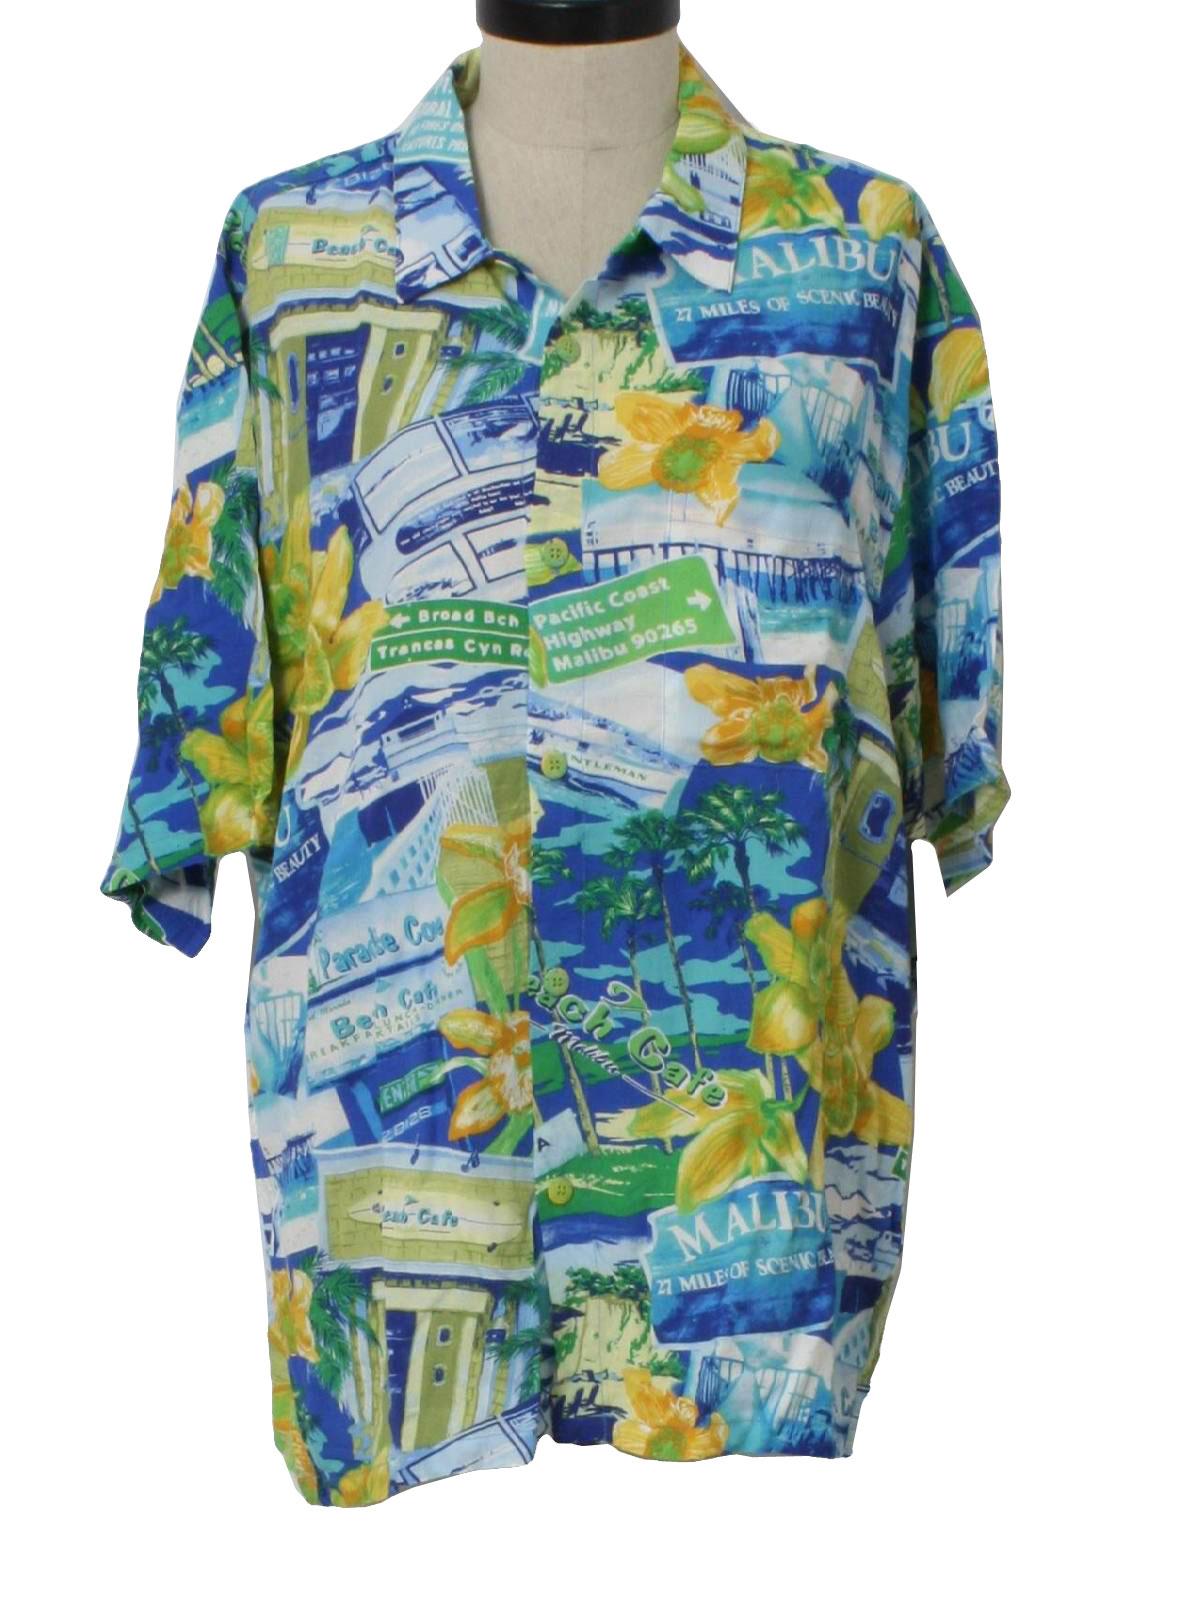 faac6a5fc7e 80s Vintage Jams World Hawaiian Shirt  80s -Jams World- Mens white  background